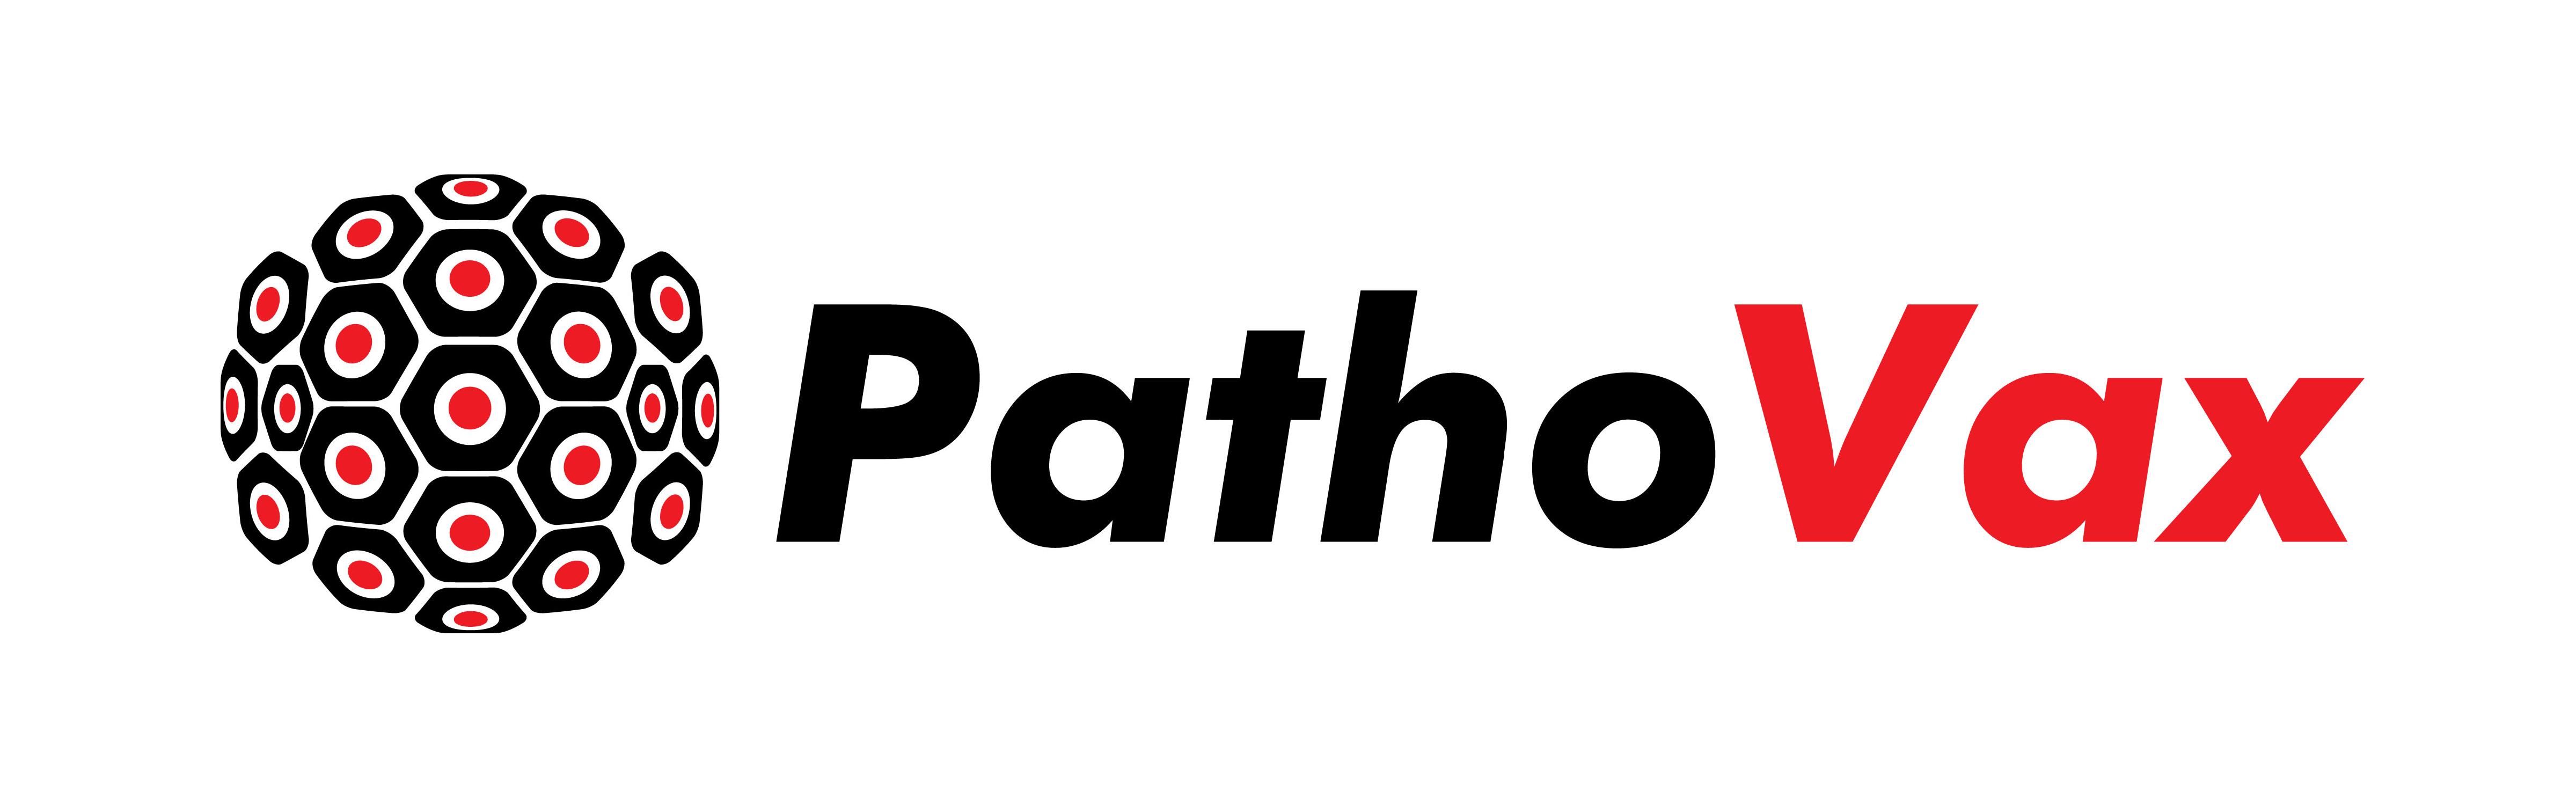 PathoVax company logo